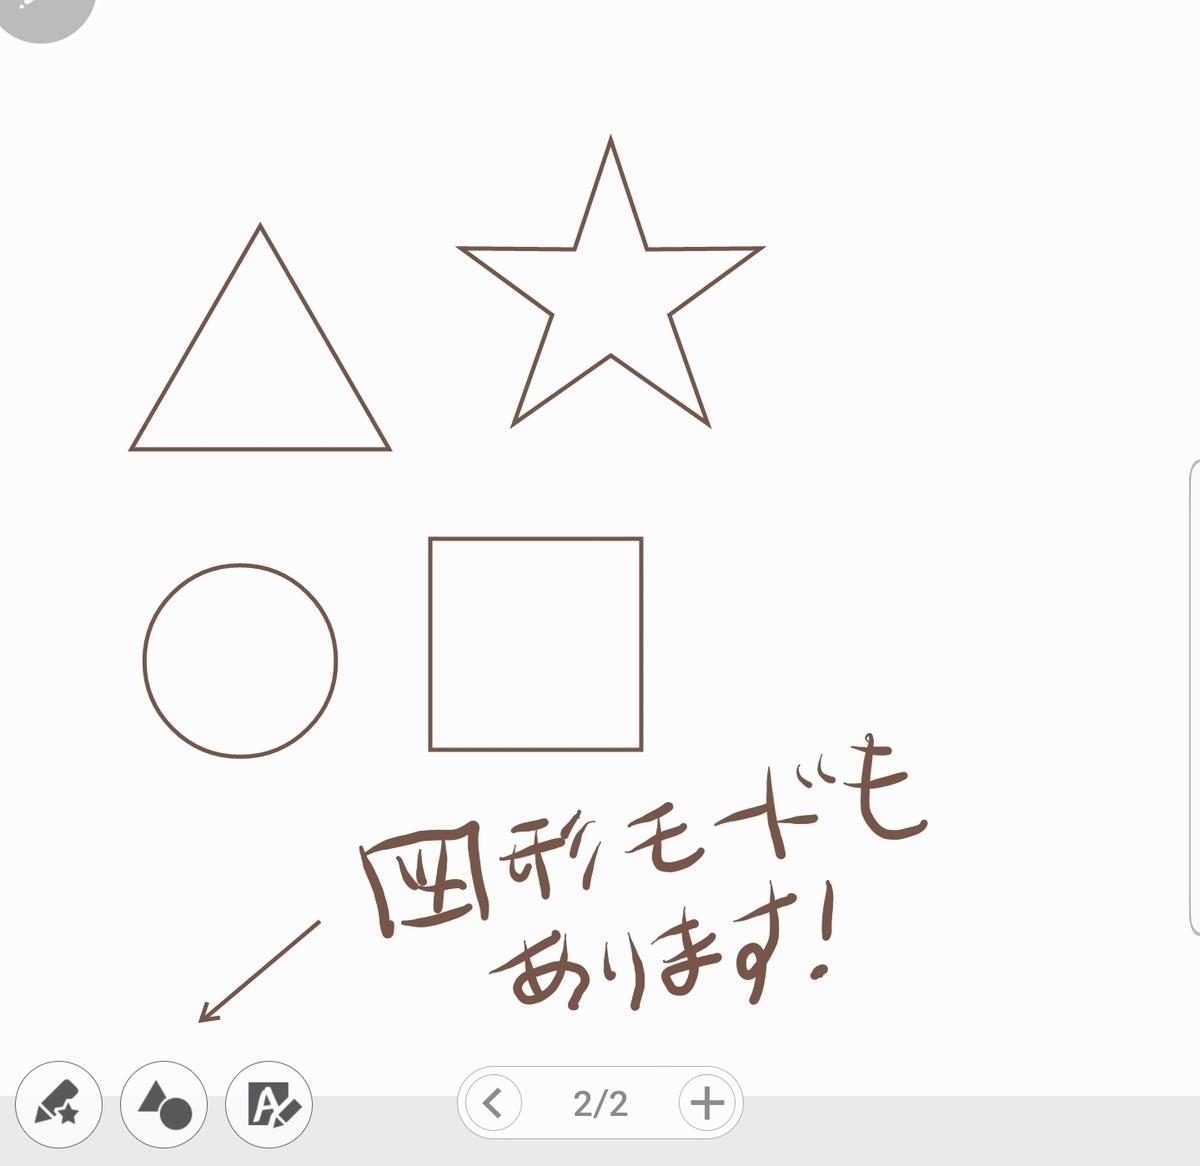 f:id:ma_sugiyama:20200206223813j:plain